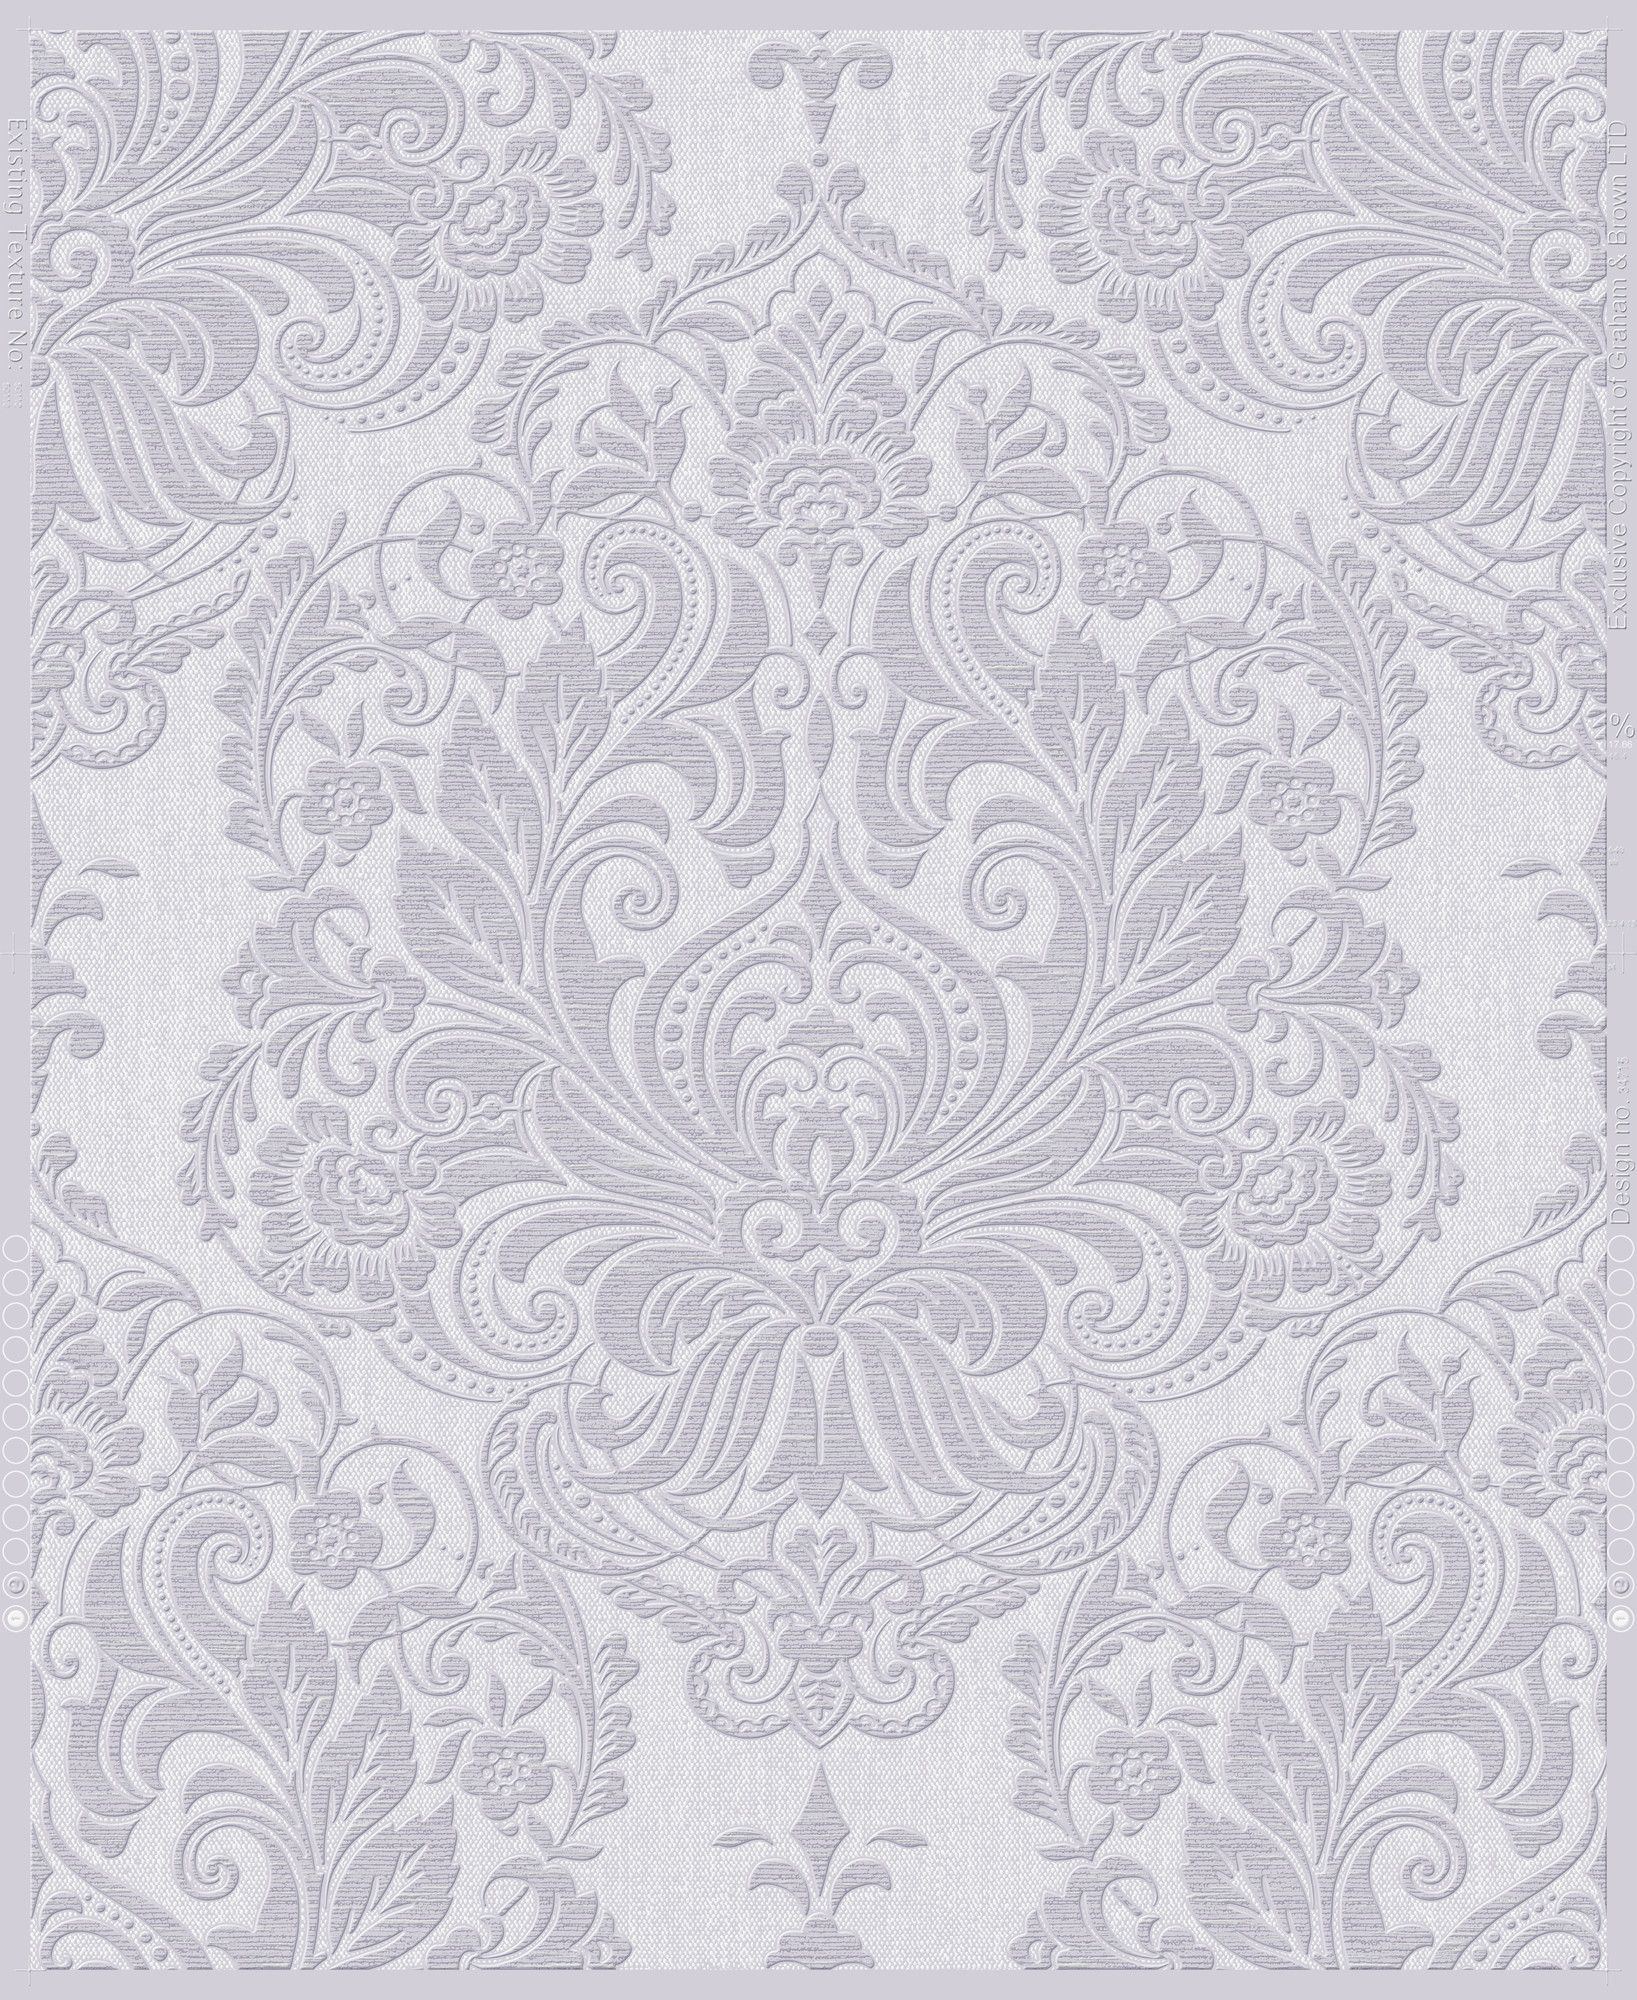 Olana 33 X 20 Damask Wallpaper Grey Wallpaper Vinyl Wallpaper Damask Wallpaper